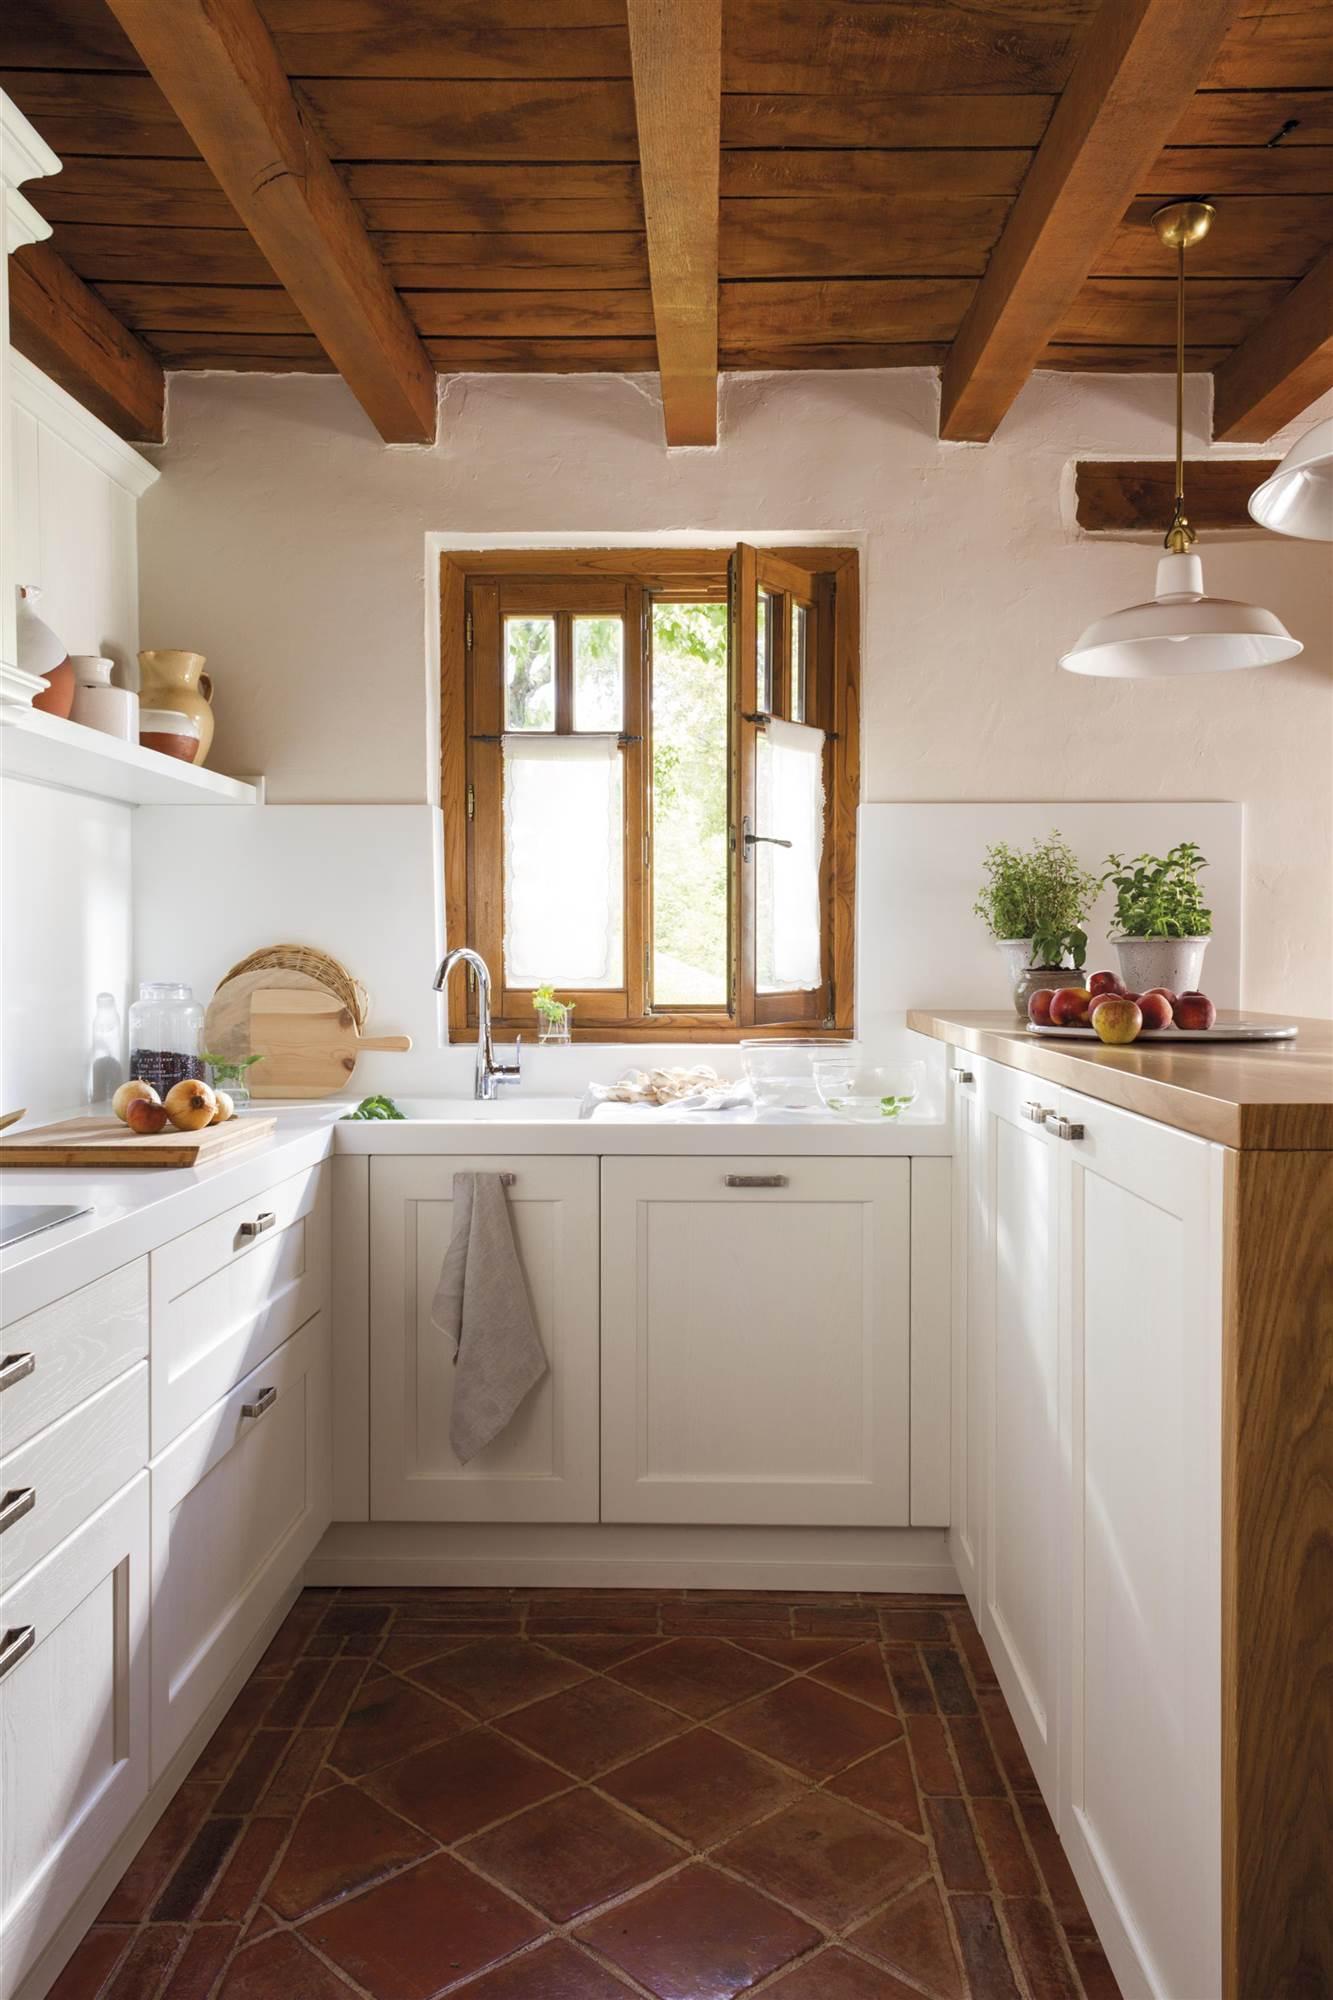 907 fotos de muebles de cocina for Muebles de madera para cocina pequena